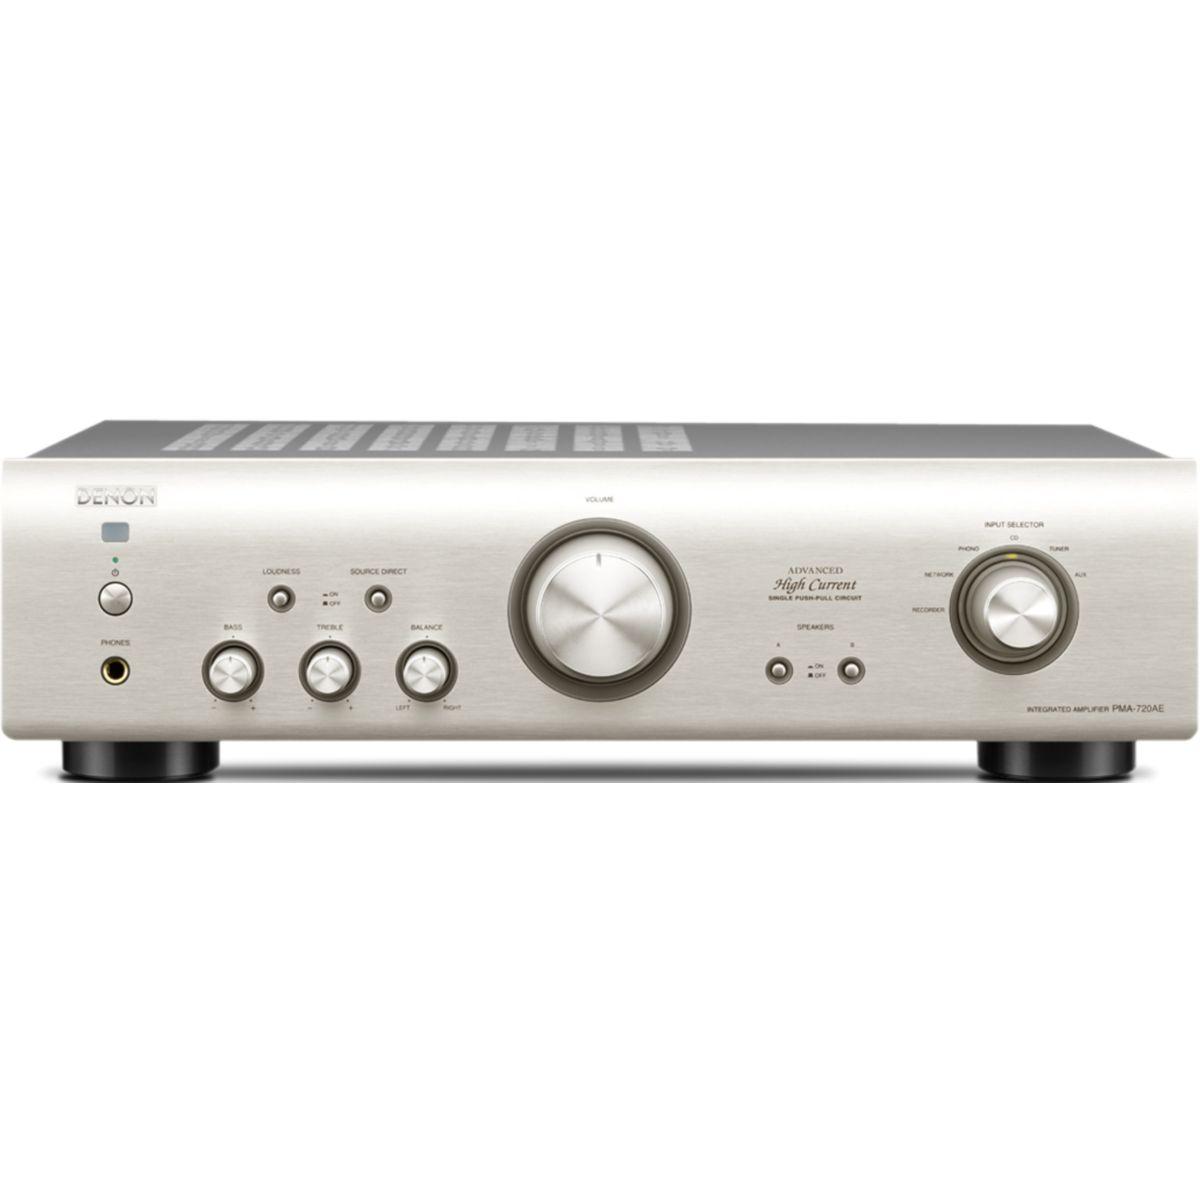 Amplificateur hi-fi denon pma720 silver - livraison offerte : code livprem